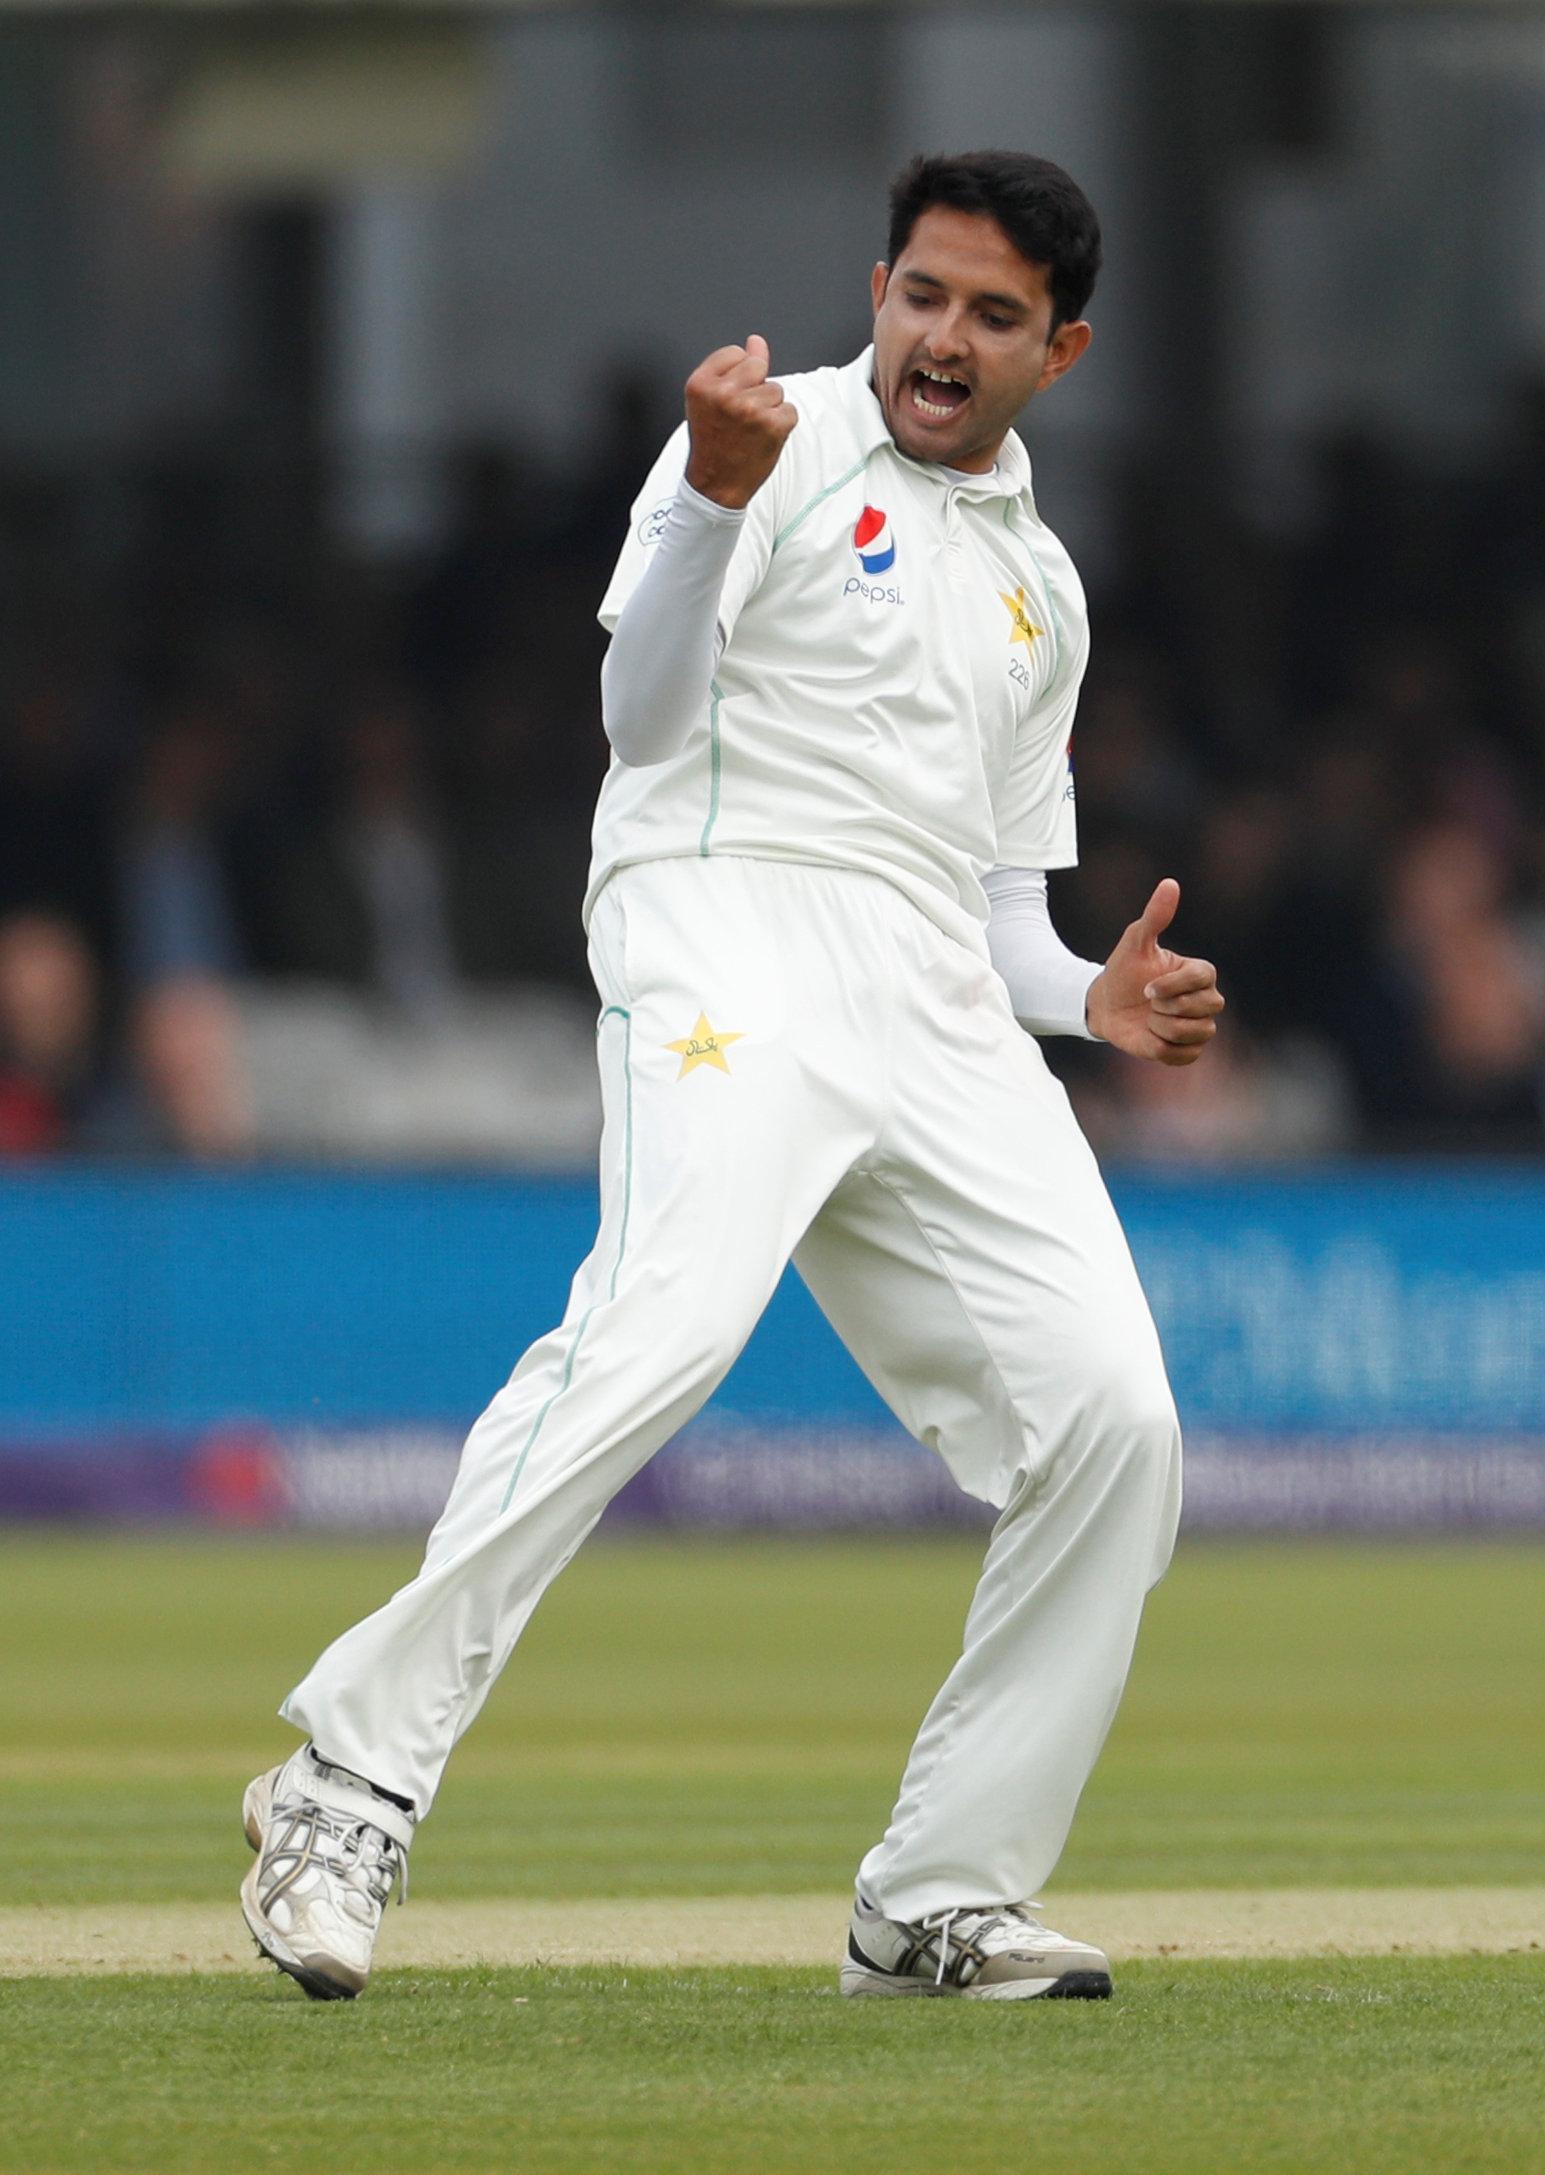 Pakistan's Mohammad Abbas celebrates taking the wicket of England's Mark Stoneman